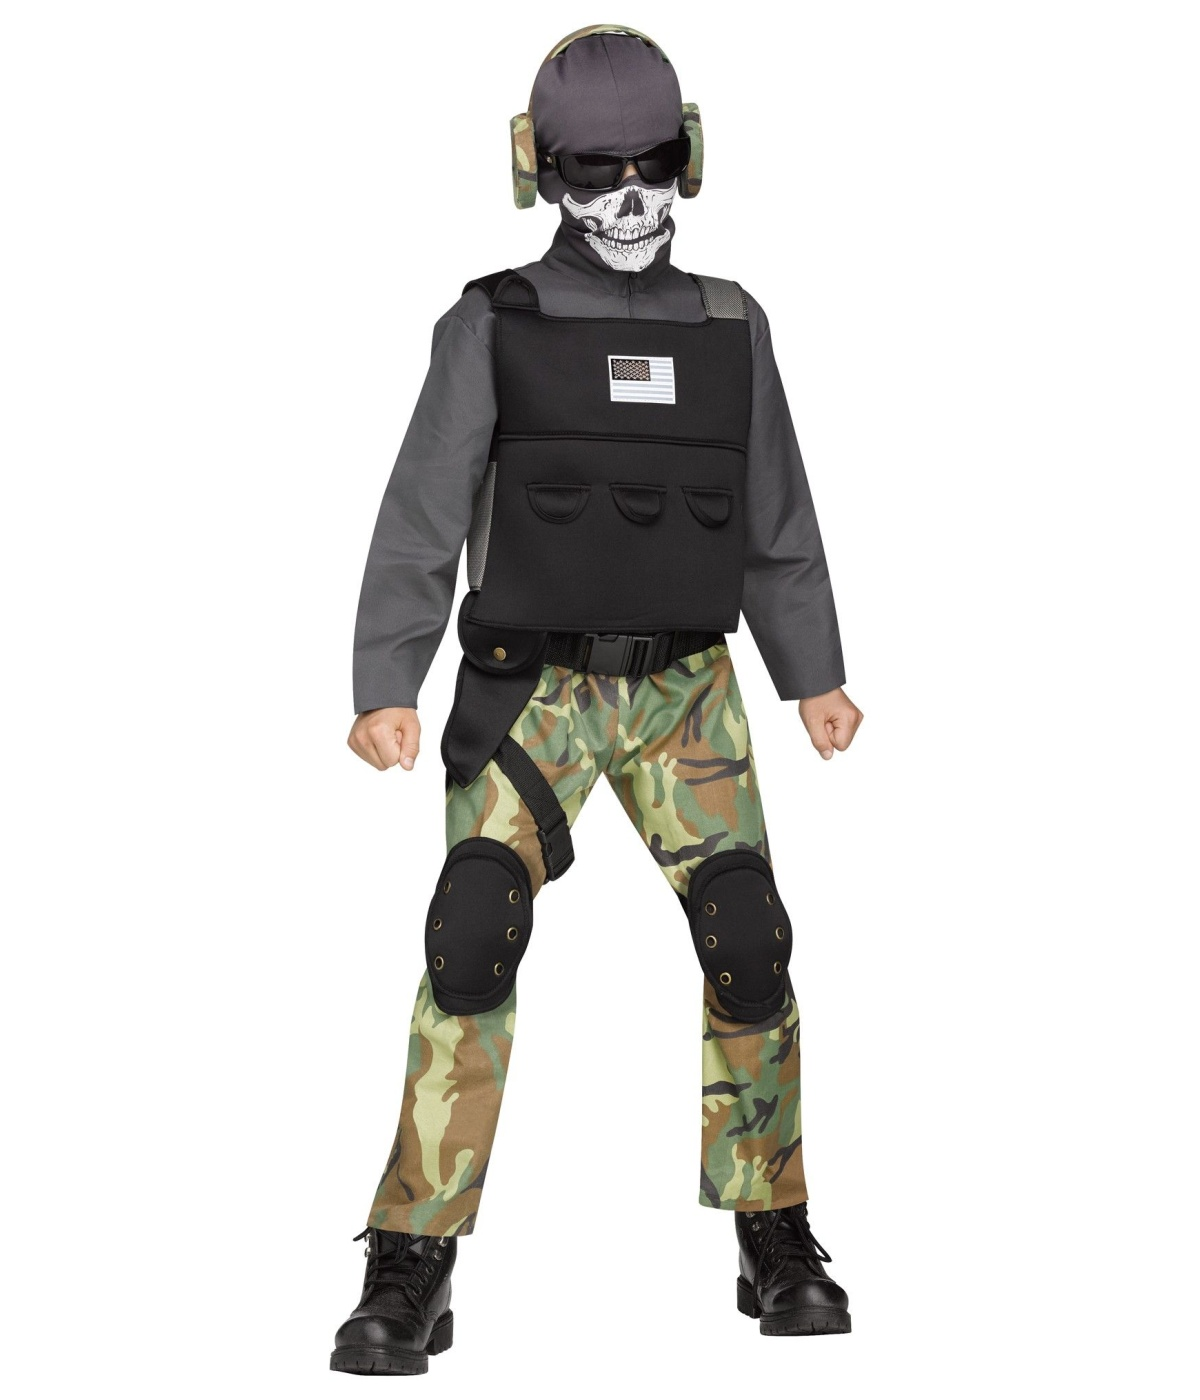 Fierce Skull Soldier Boys Costume General Category